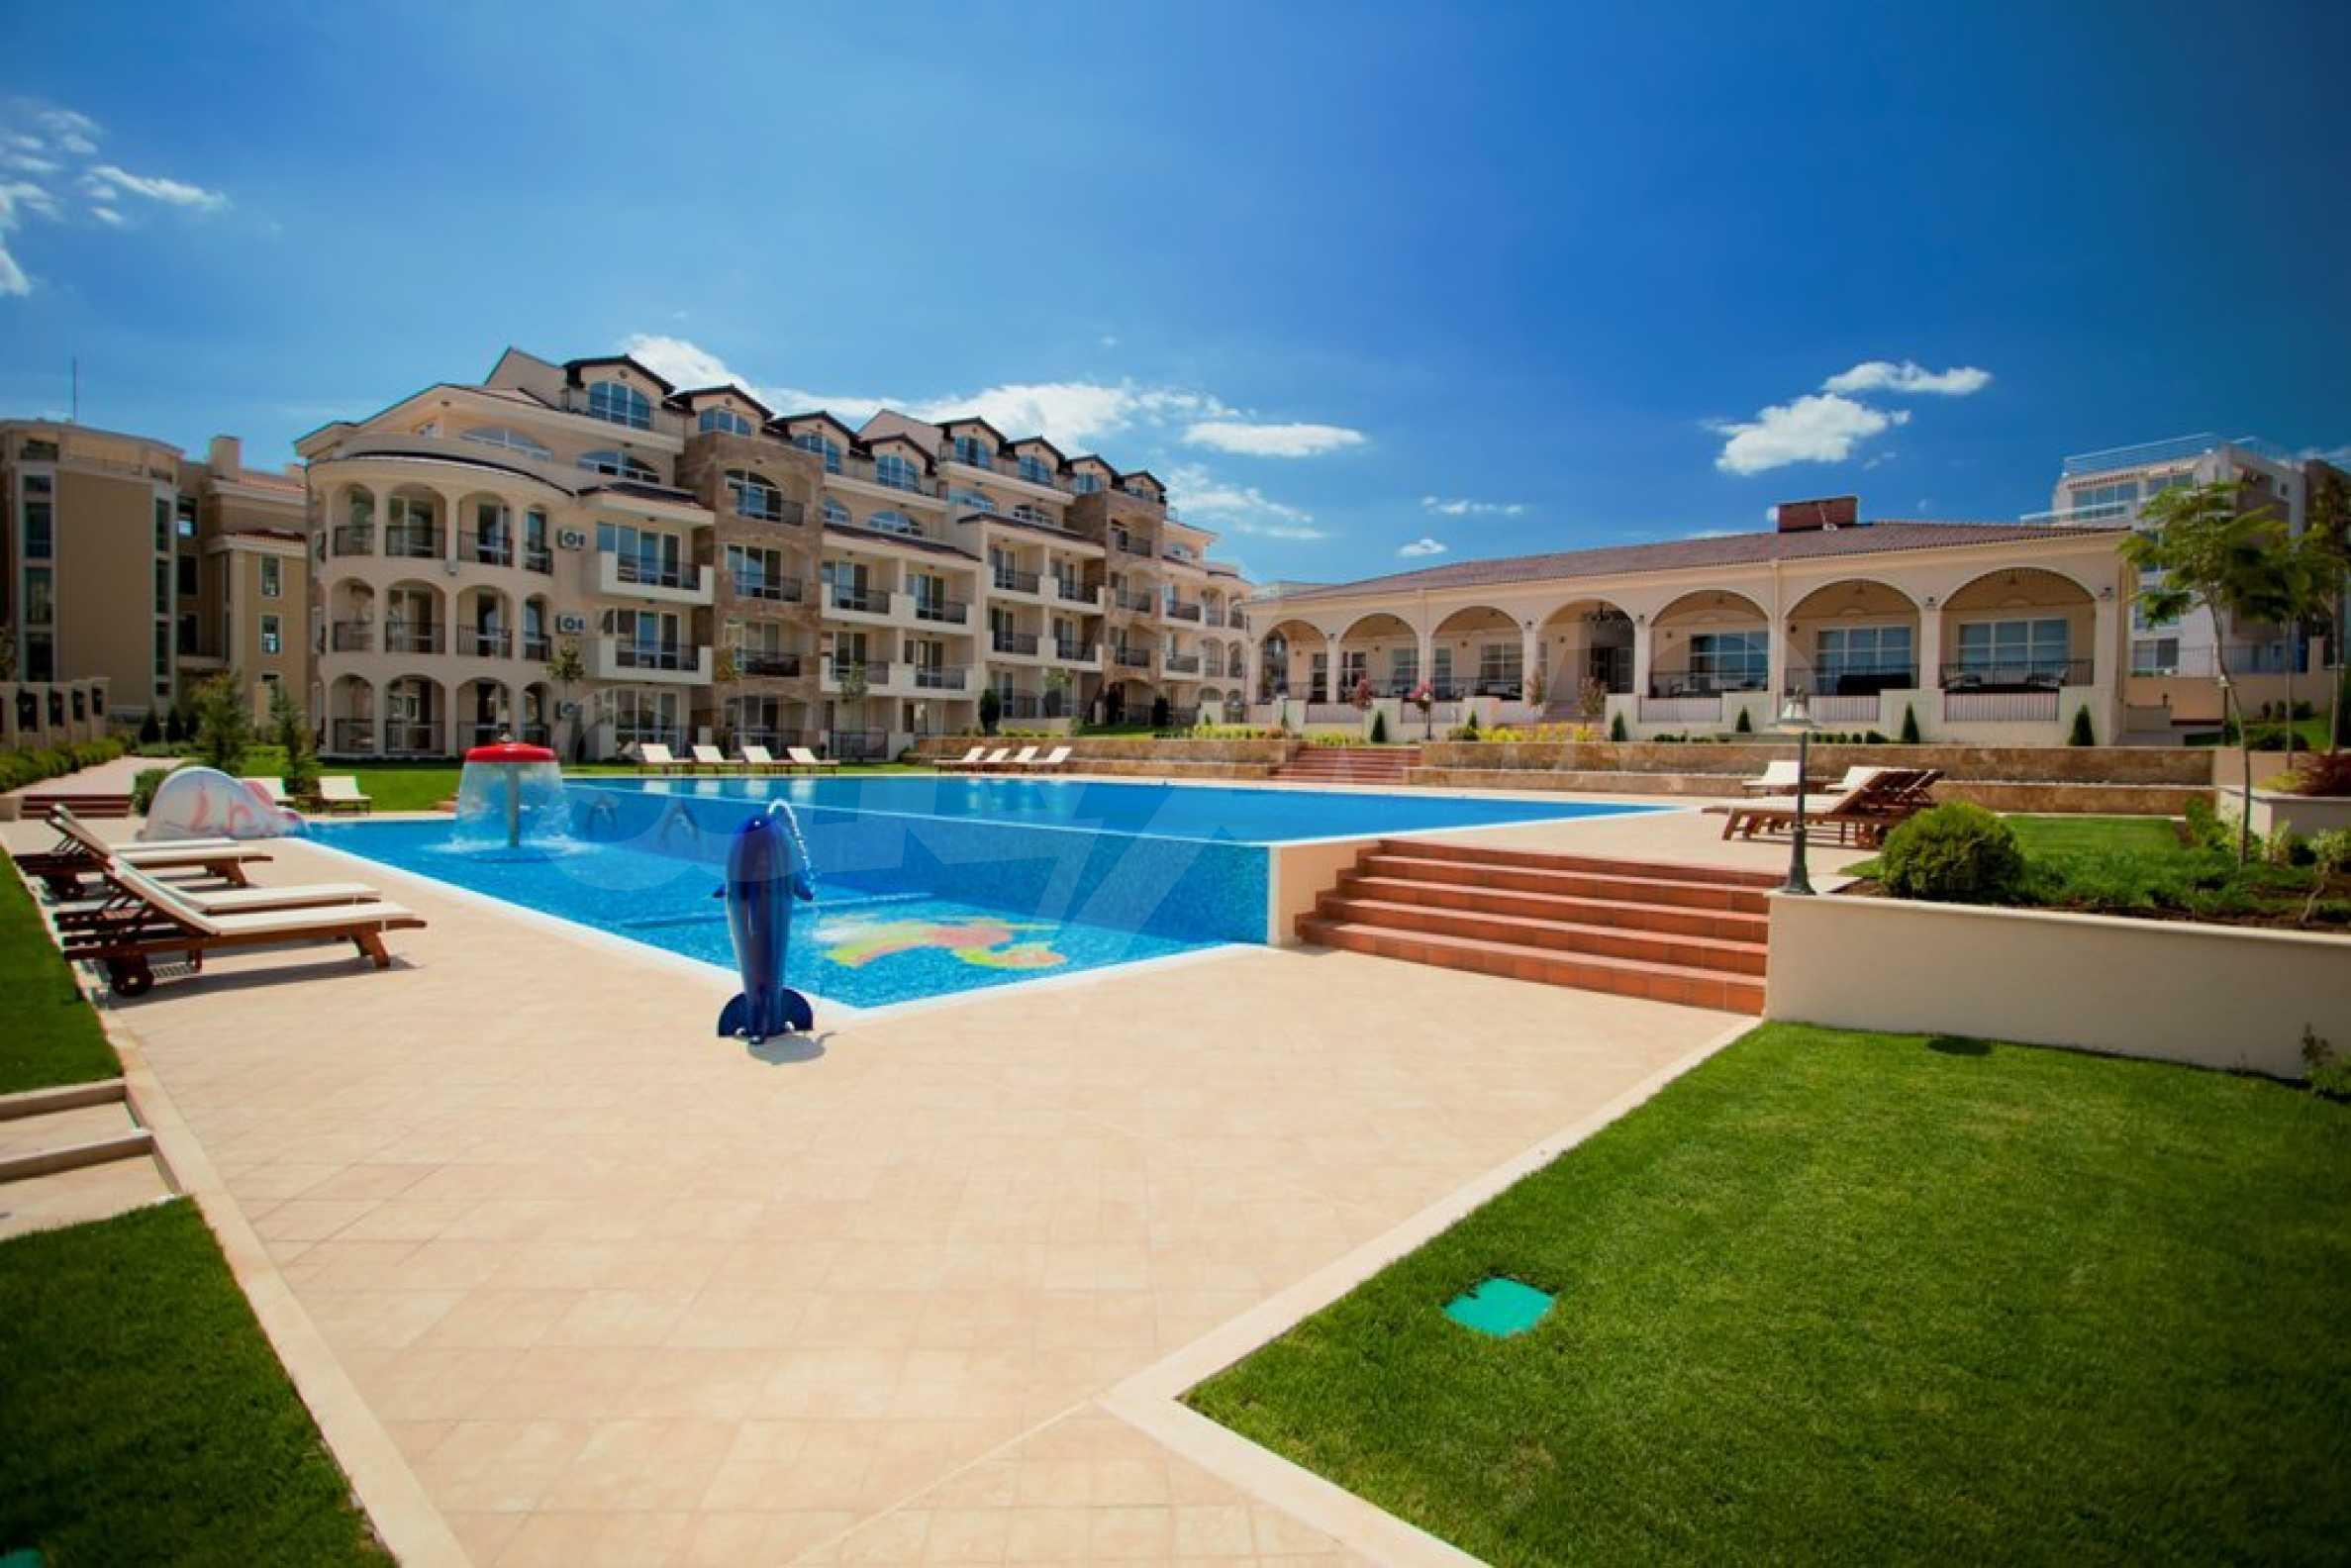 New apartment complex Atia resort in Chernomorets 11